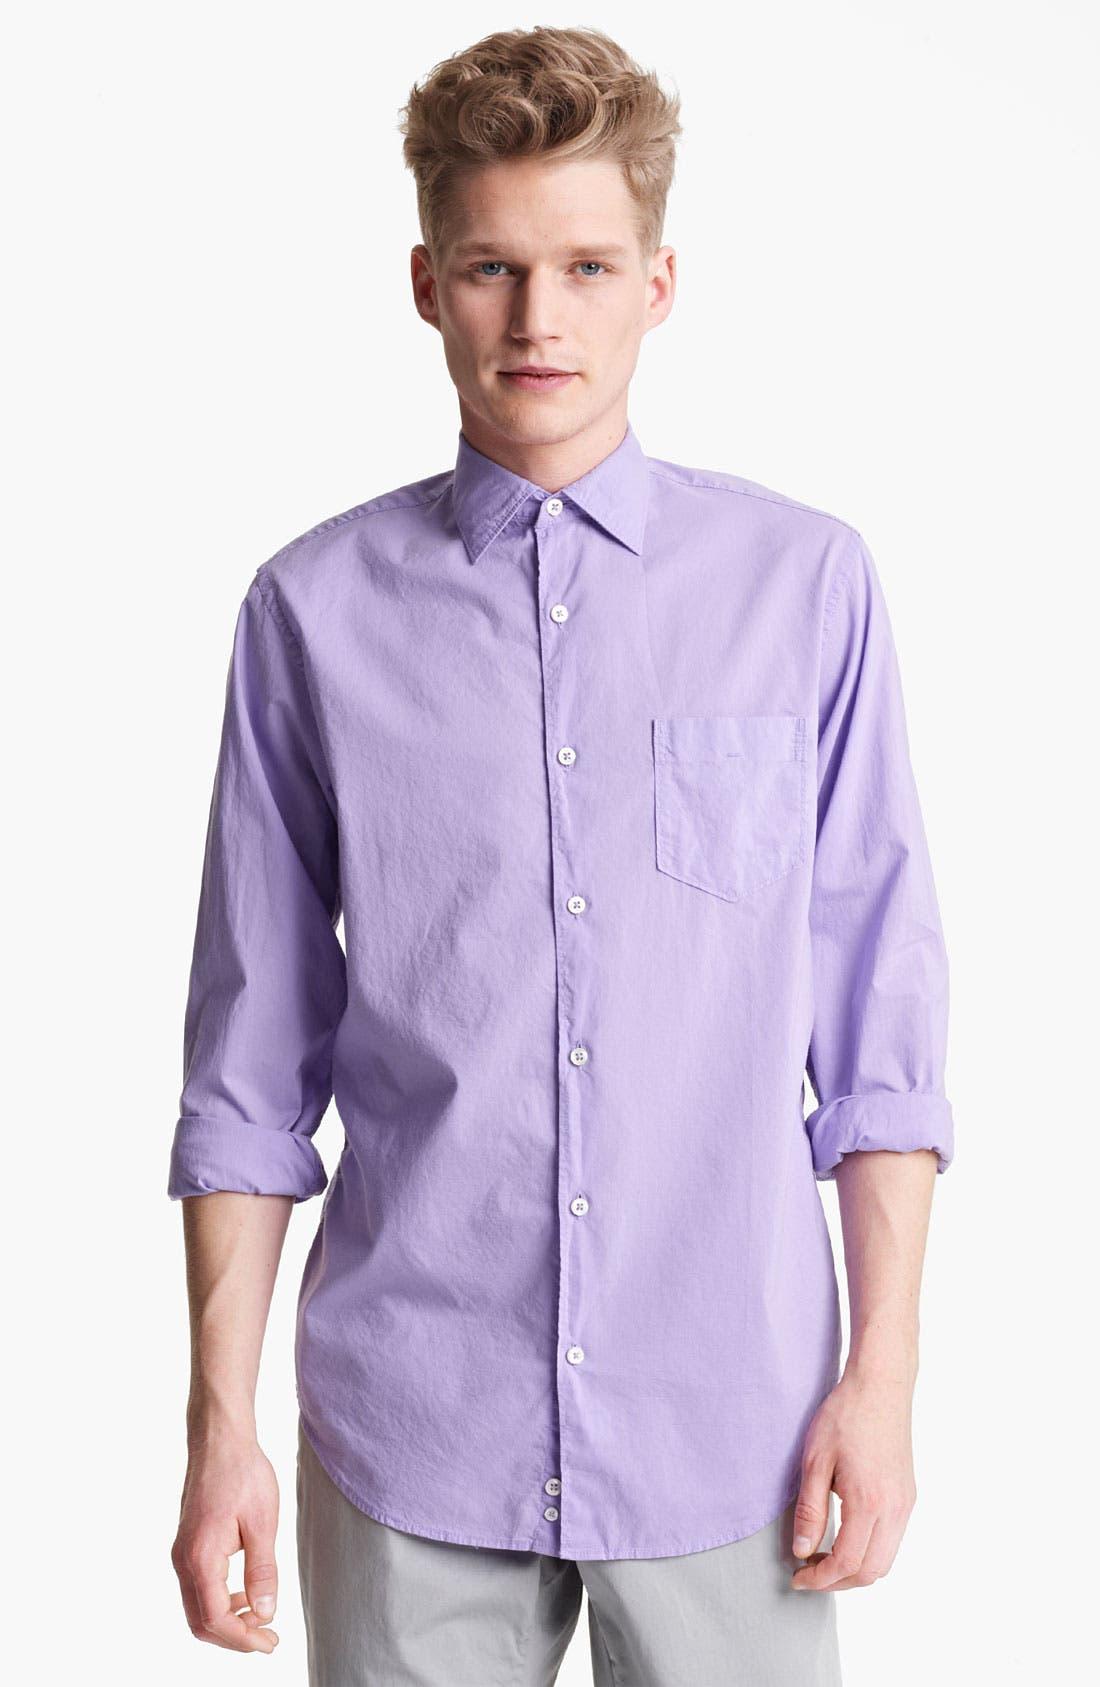 Alternate Image 1 Selected - Mason's Poplin Woven Shirt